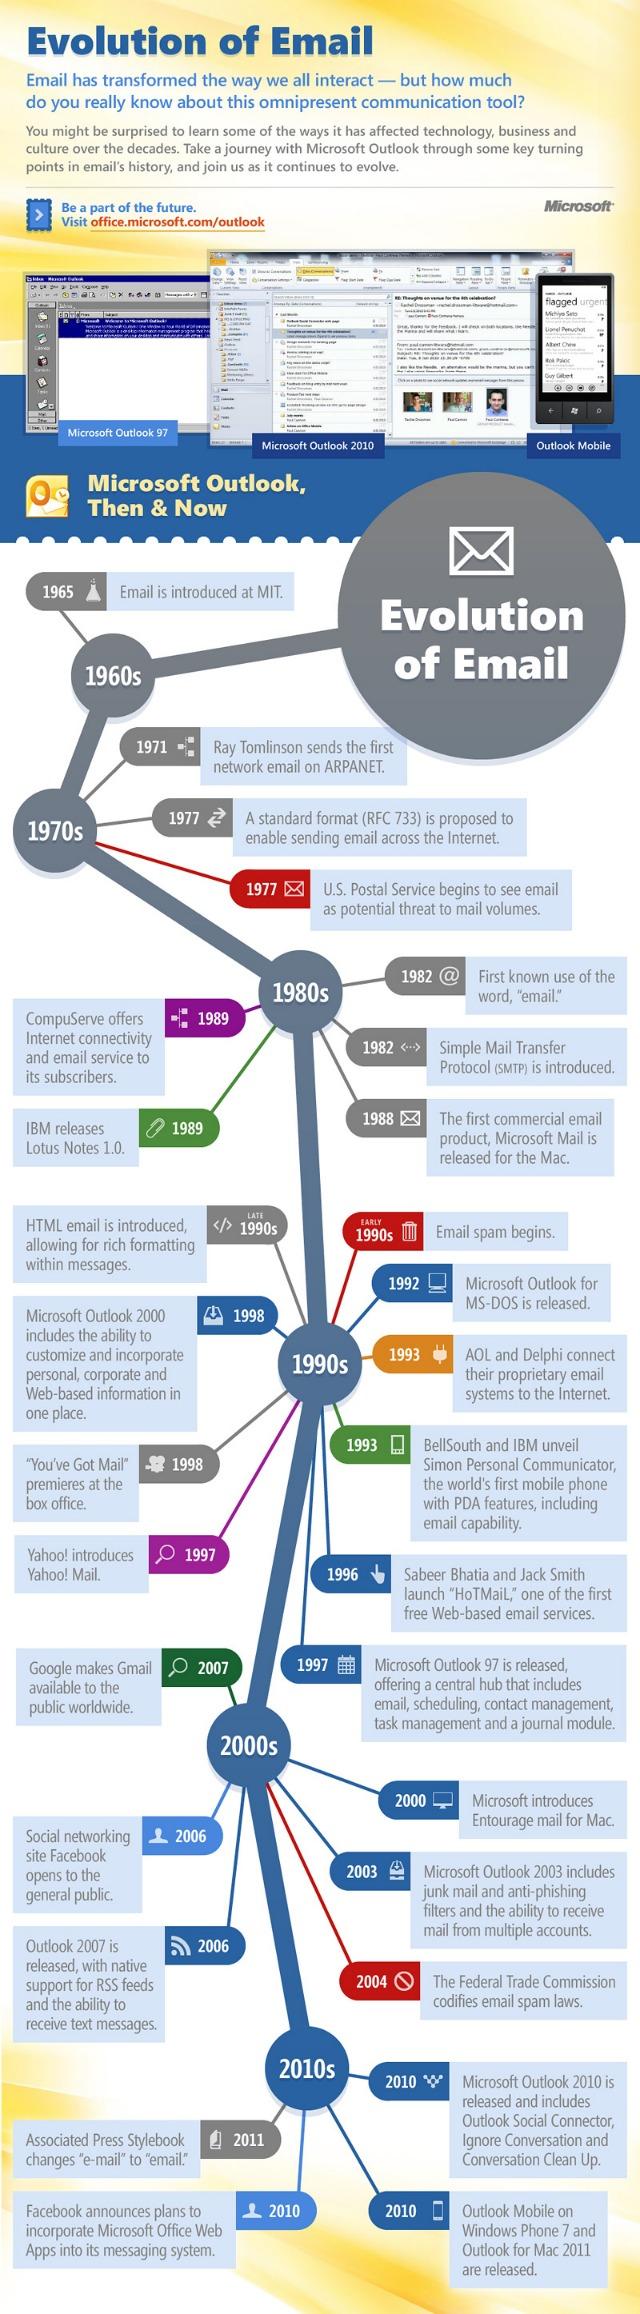 evolutia-emailului-scrisori-digitale-infografic